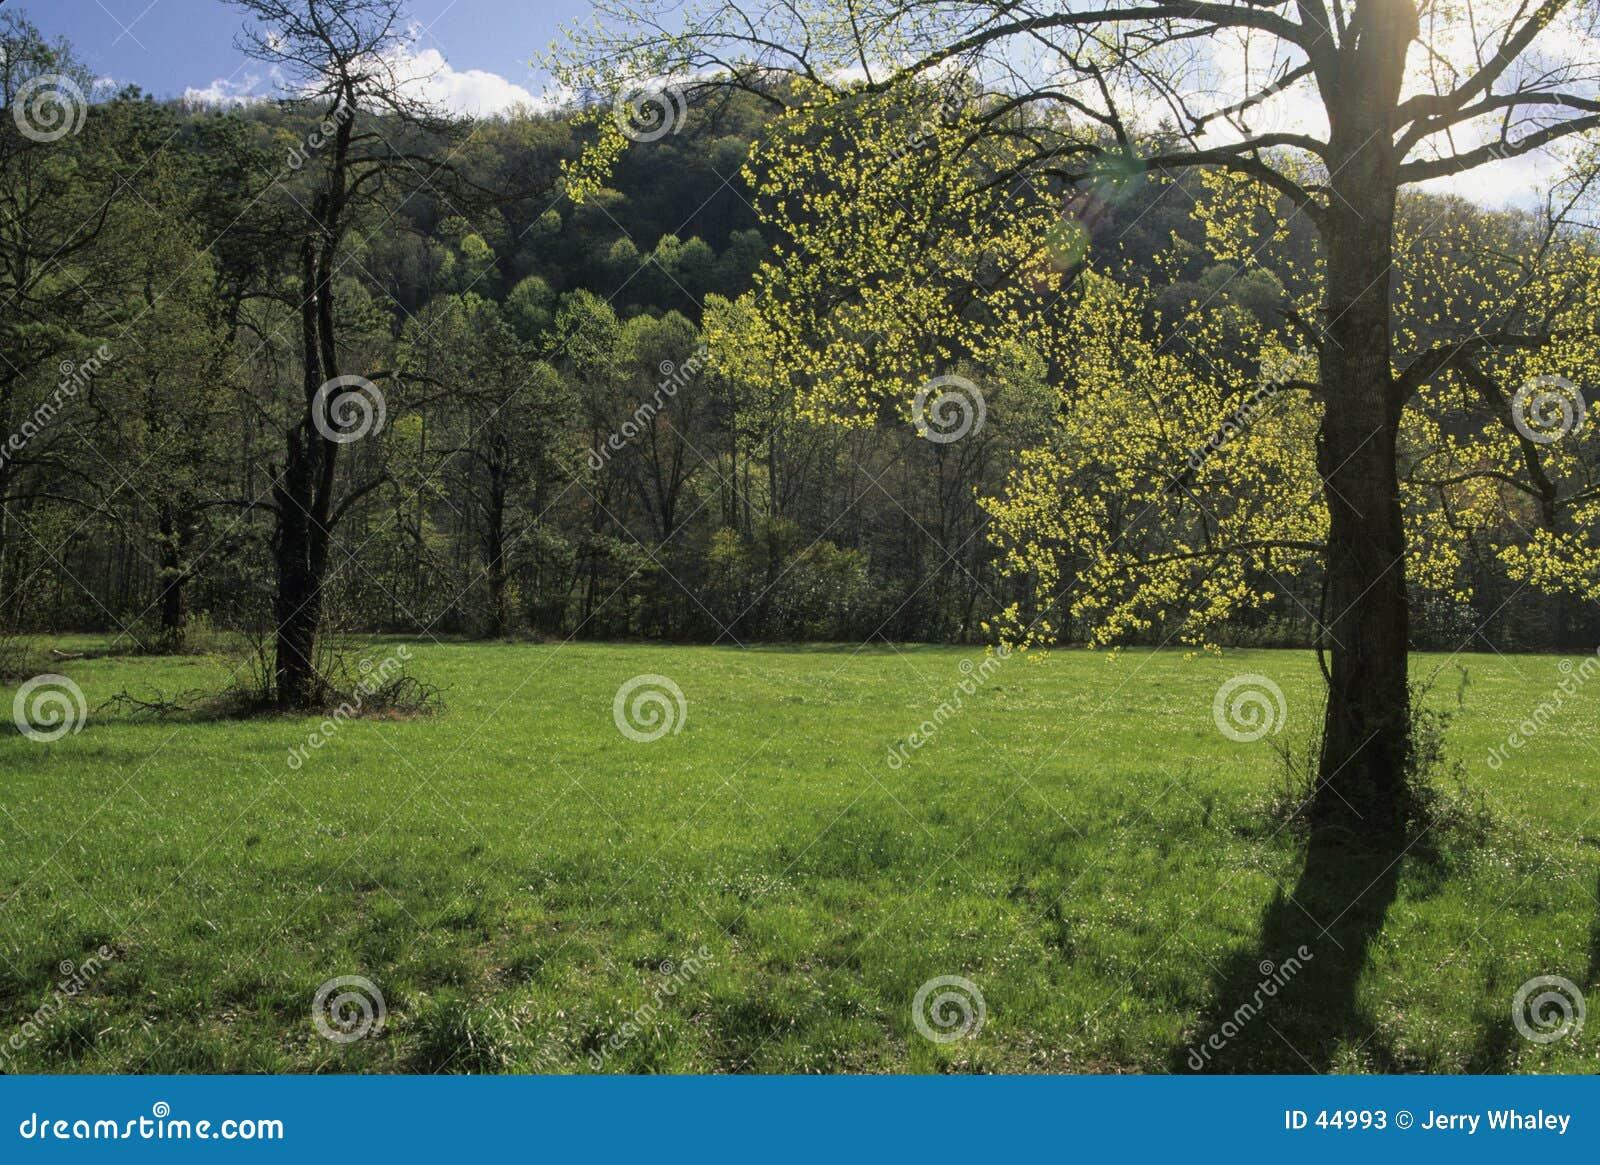 Sunshine, Tree, Meadow